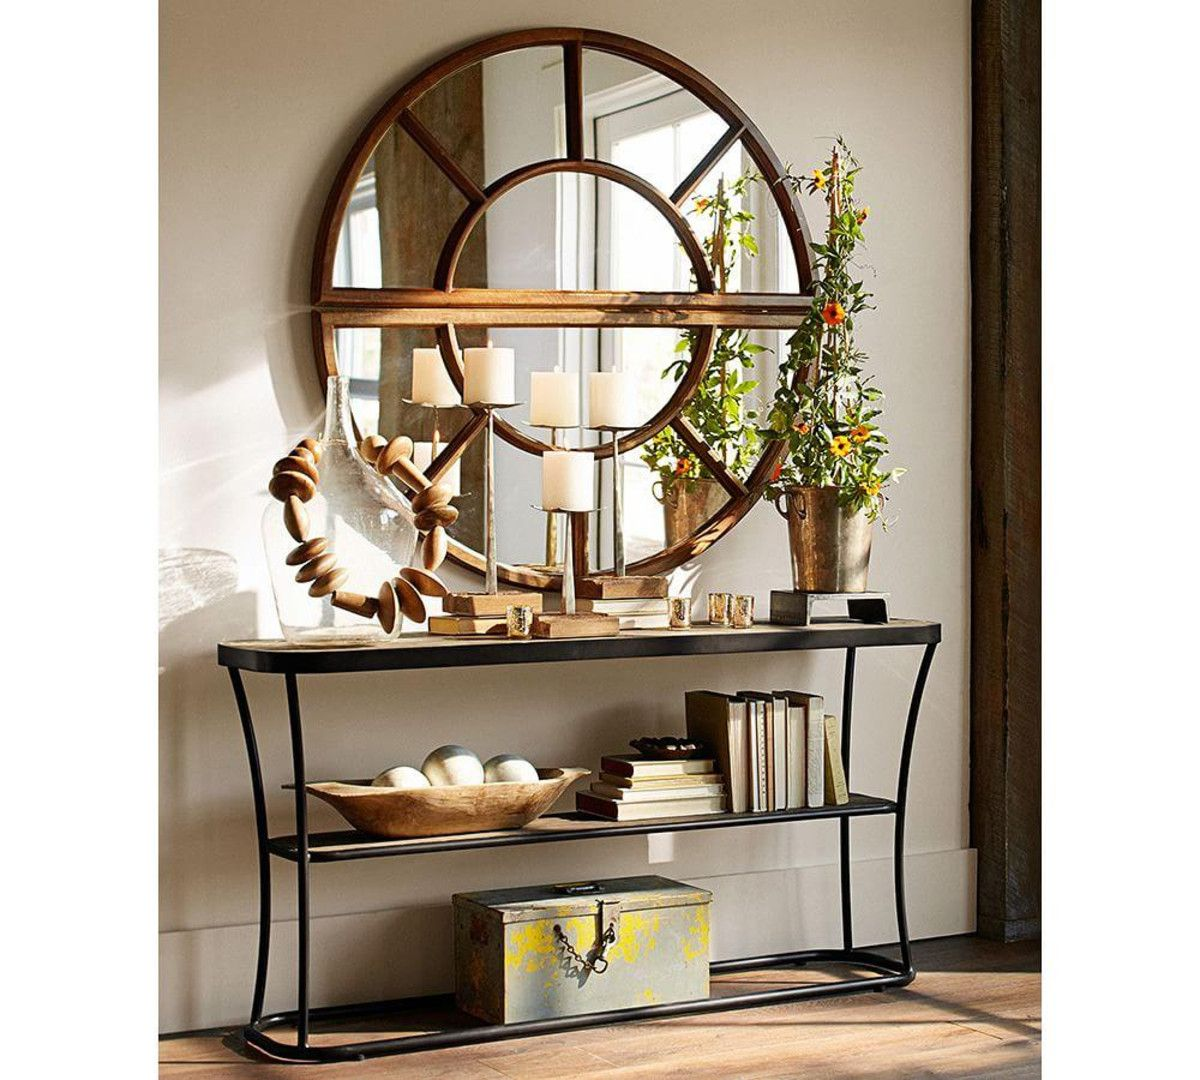 Arched Paned Mirror Mesa De Centro Madera Decoraci 243 N De